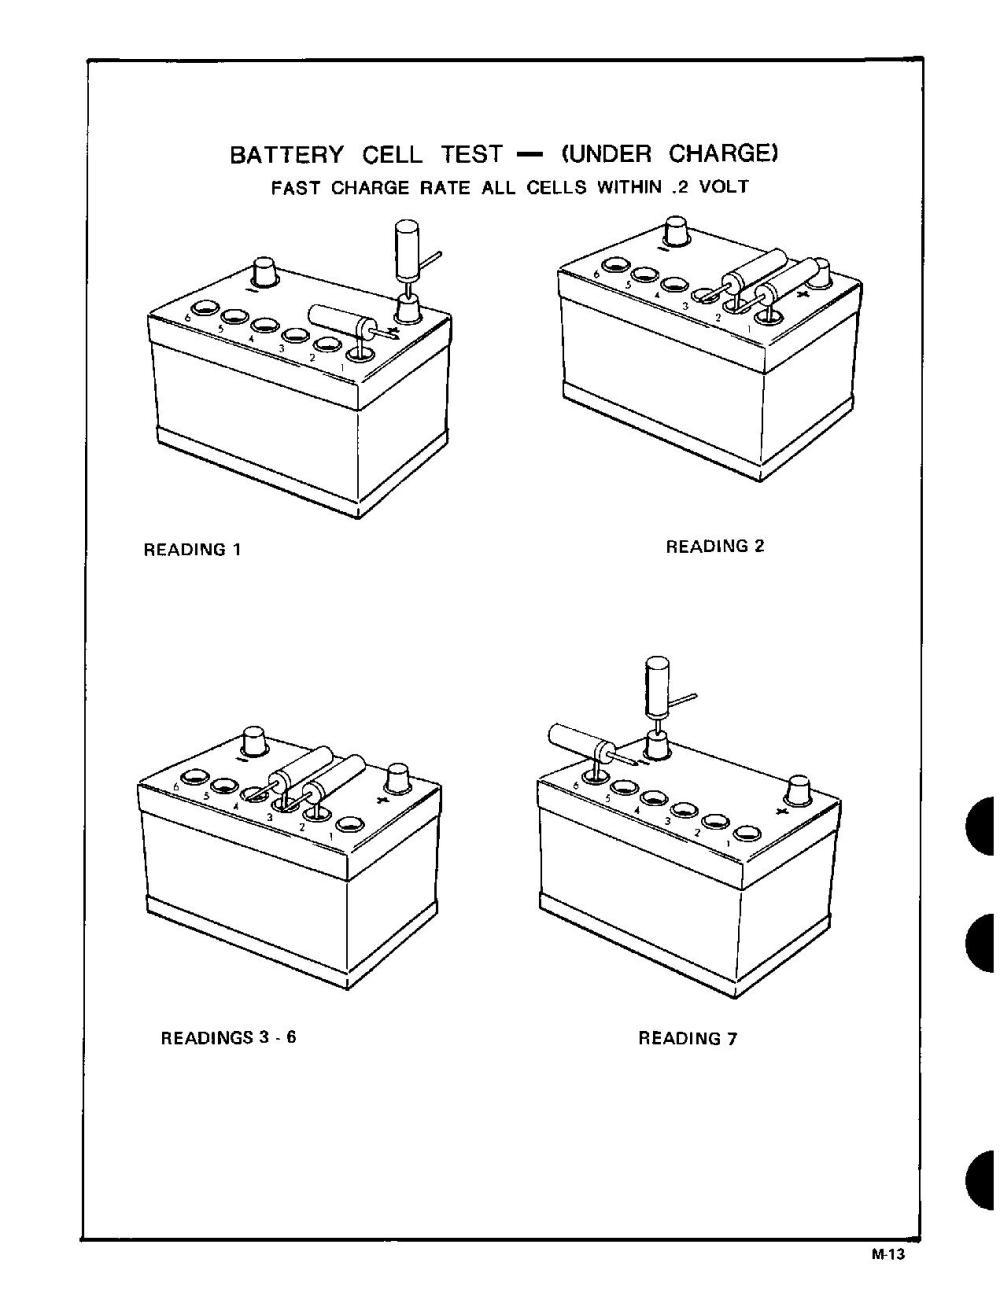 medium resolution of 1975 mgb wiring schematic mgb engine wiring wiring diagram 1973 mgb wiring diagram 1973 mgb